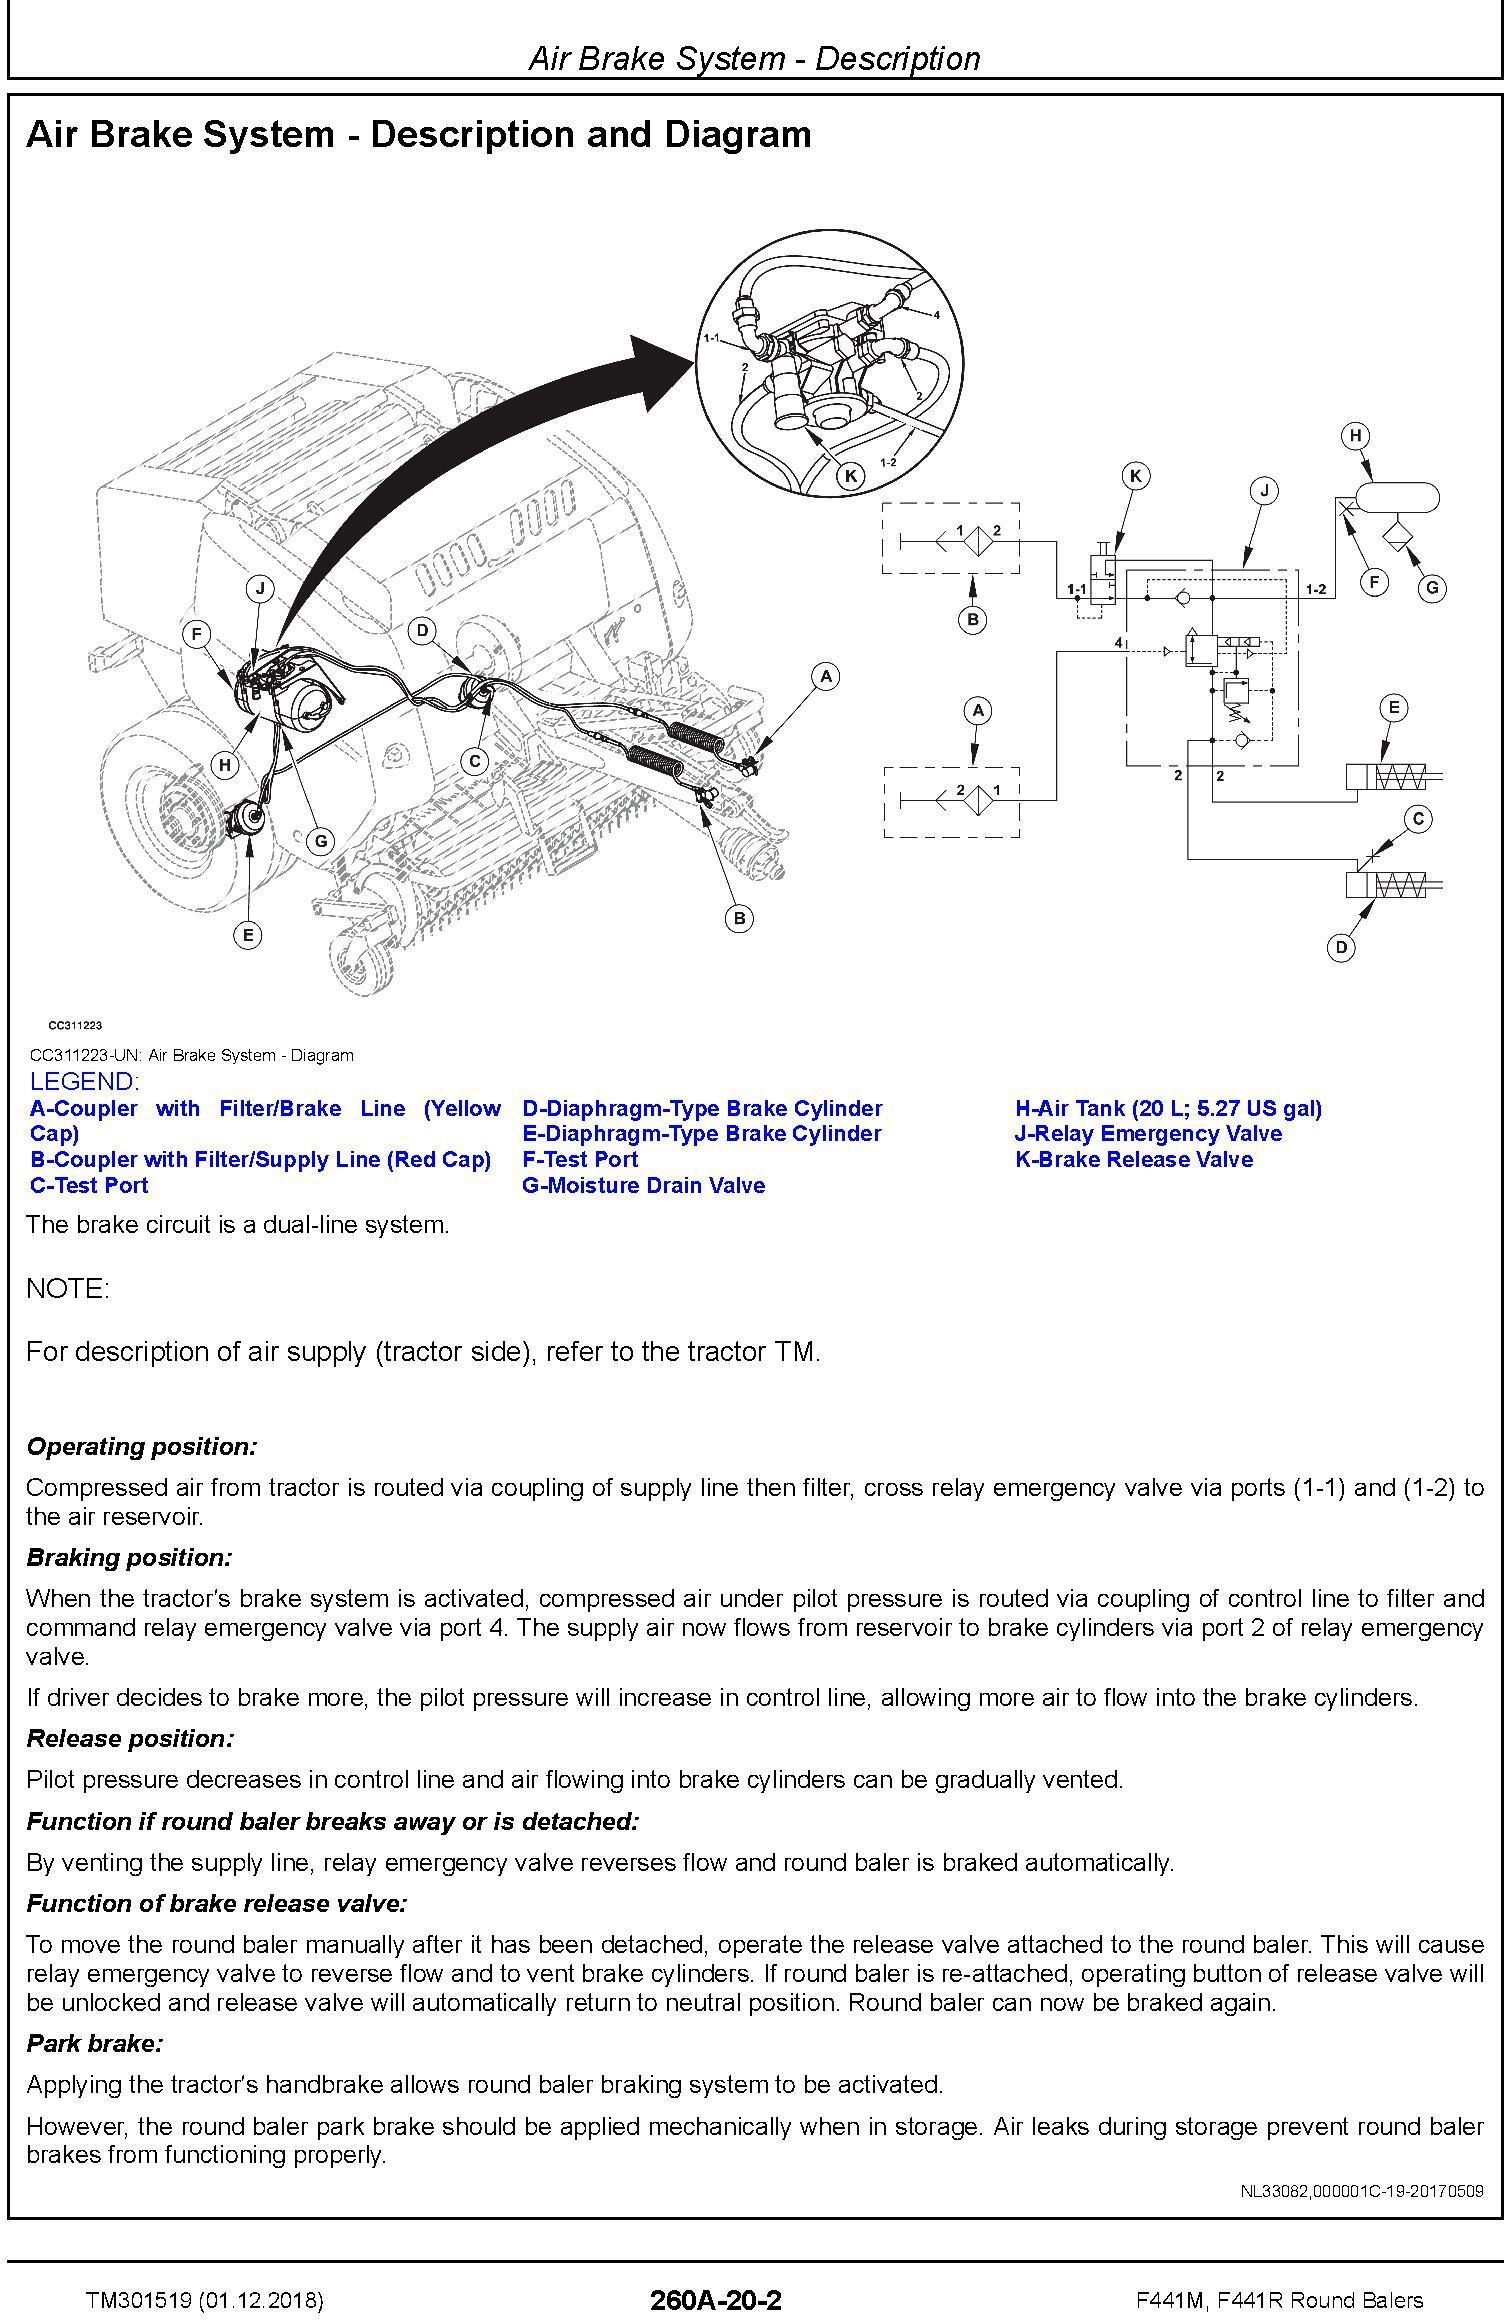 John Deere F441M, F441R Round Balers Diagnostic Technical Service Manual (TM301519) - 1